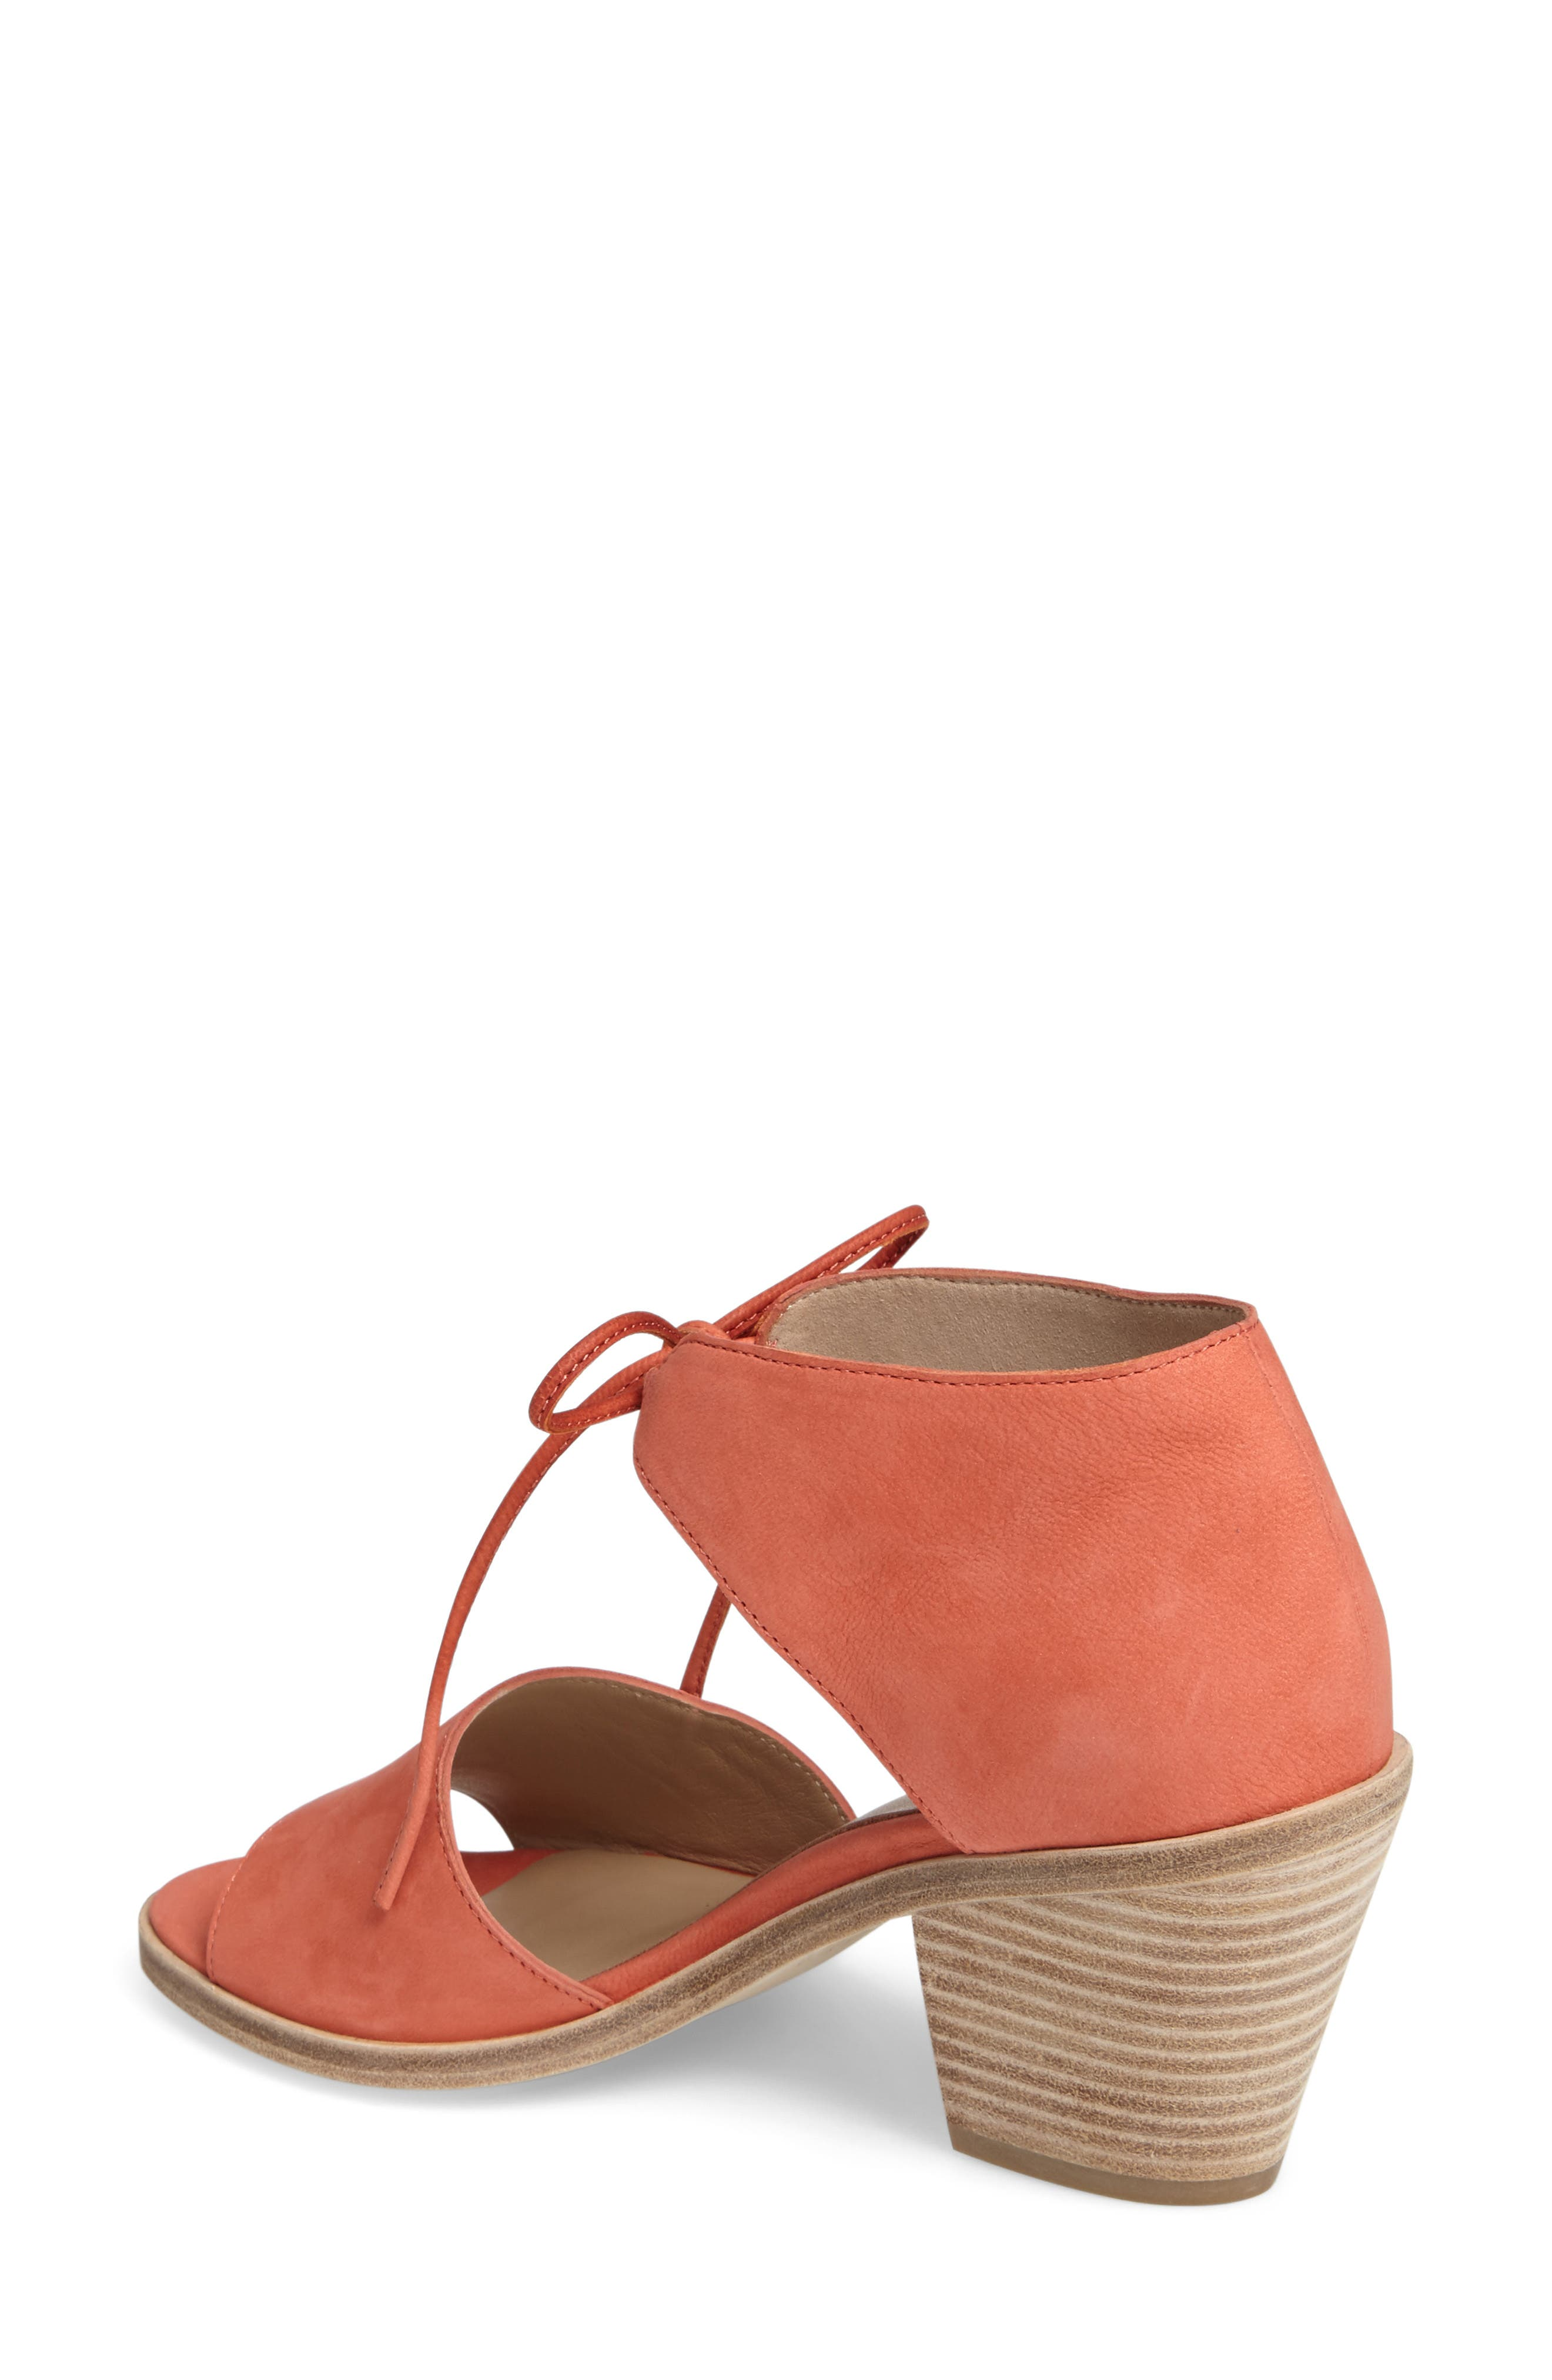 Alternate Image 2  - Eileen Fisher Ann Ankle Tie Sandal (Women)